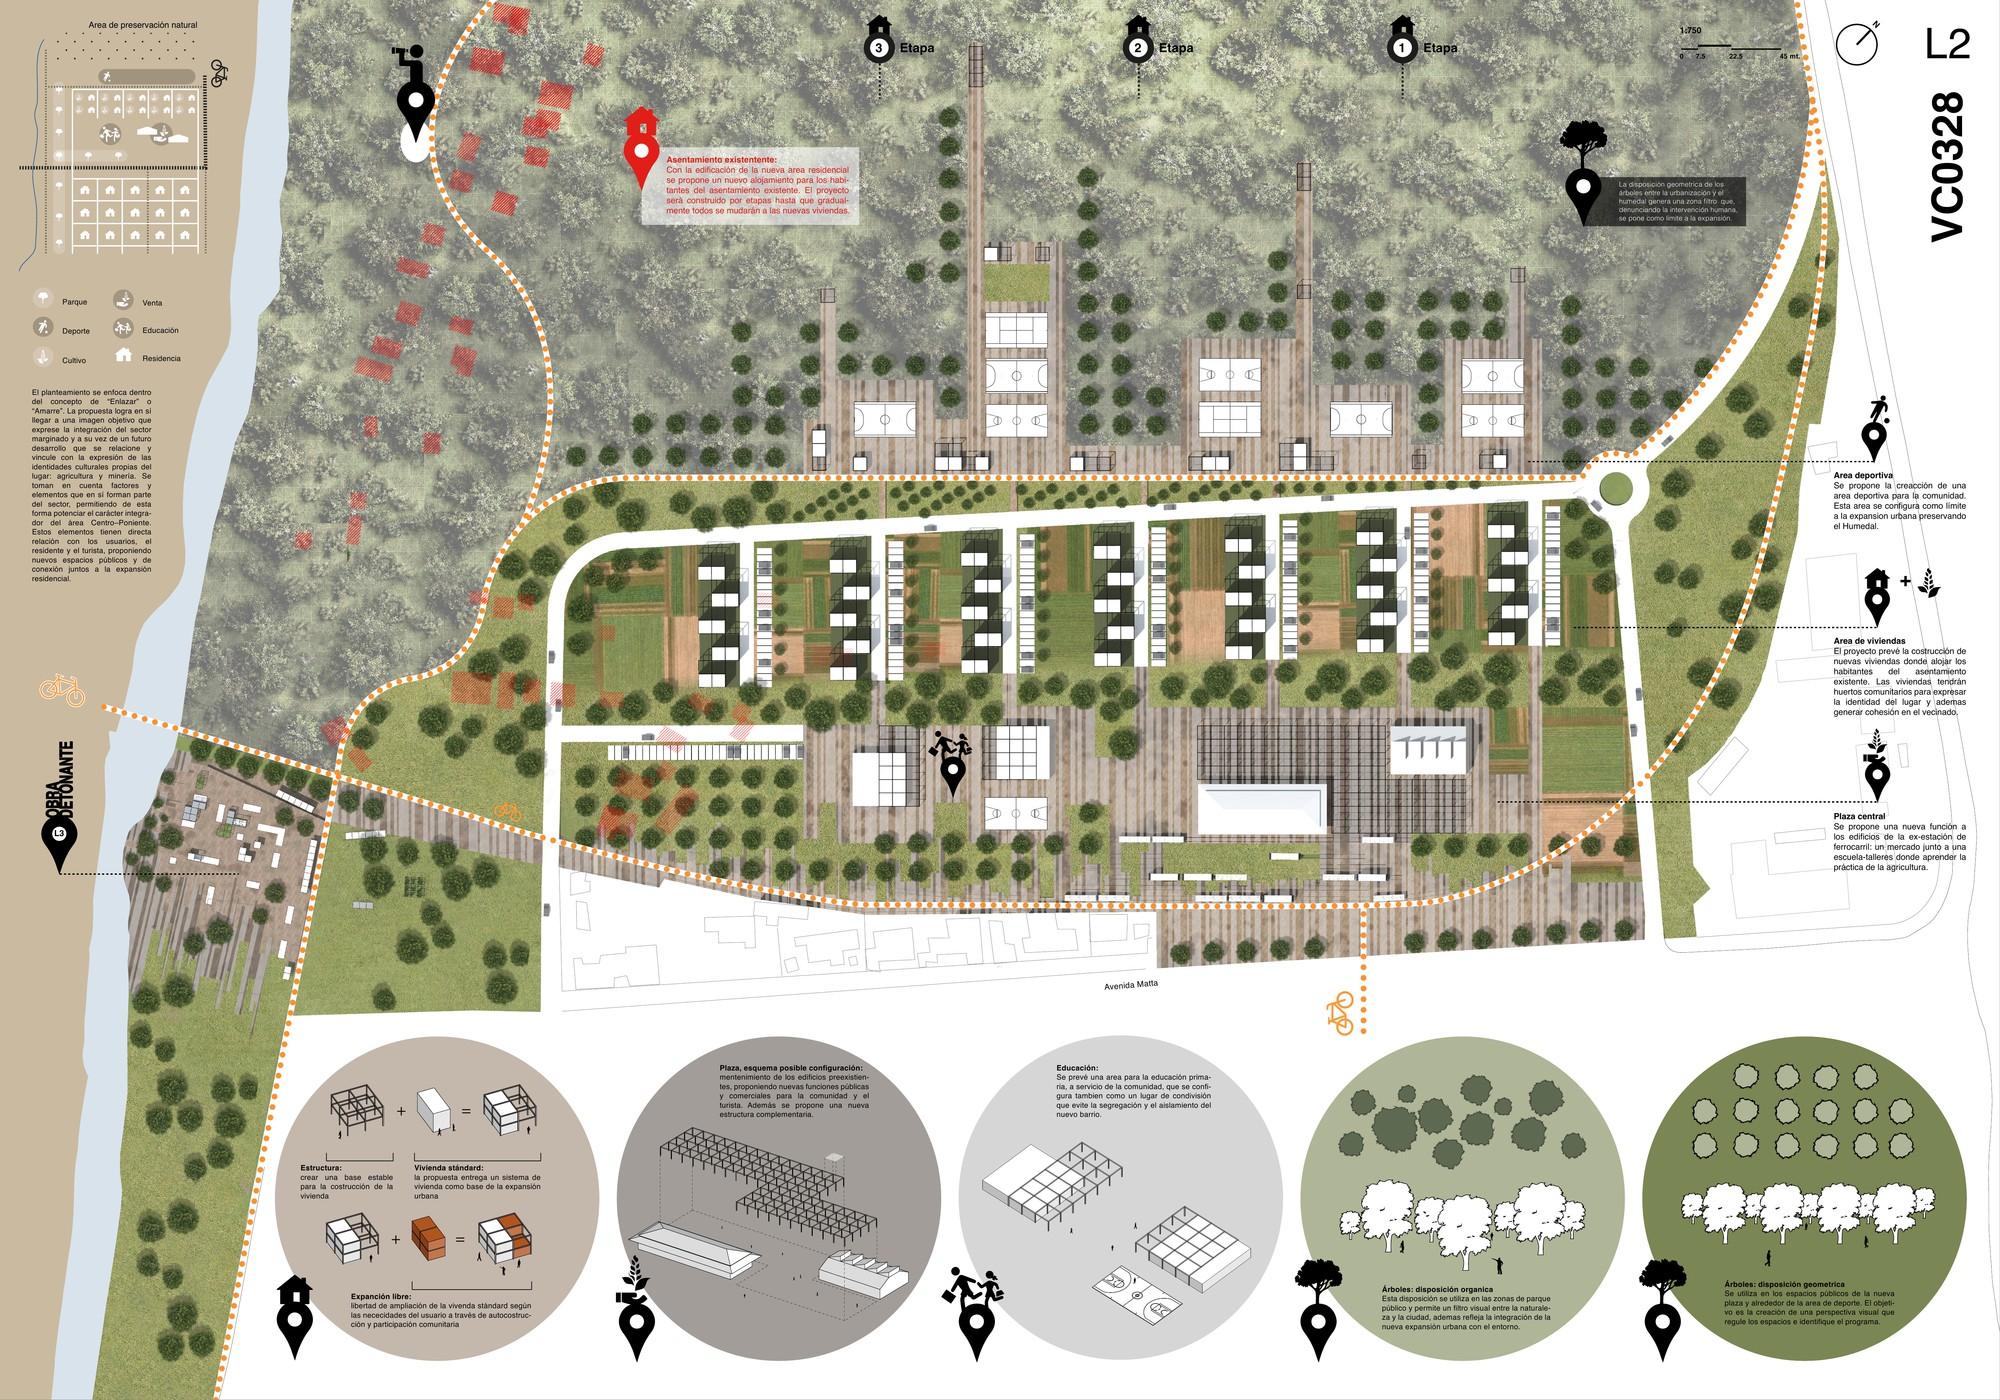 Chile presentan proyectos ganadores de concurso para for Arquitectura de proyectos